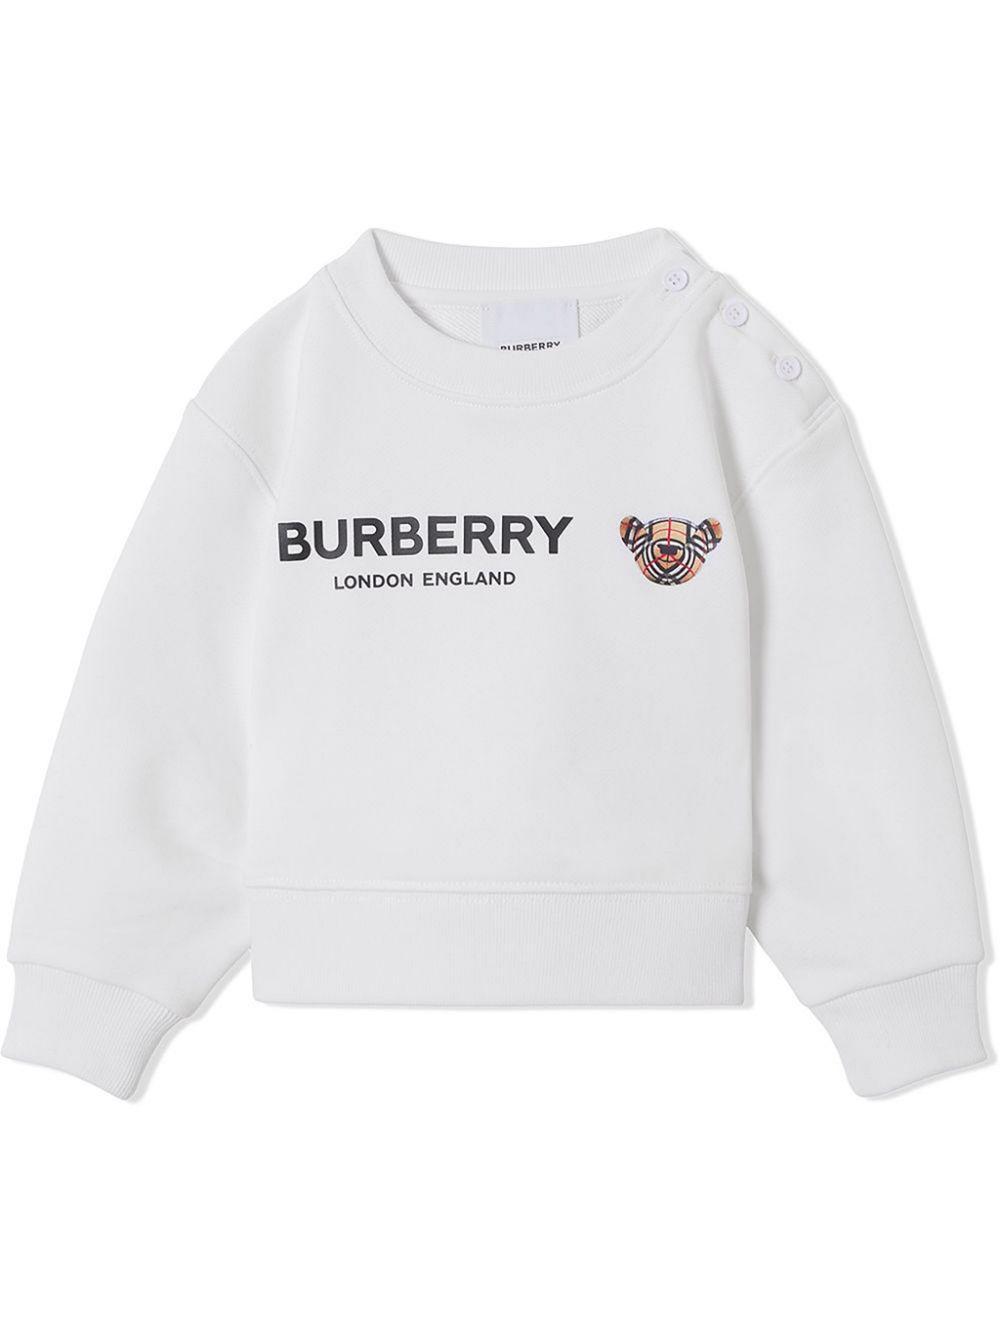 BURBERRY KIDS | Hoodie | 8042944A1464